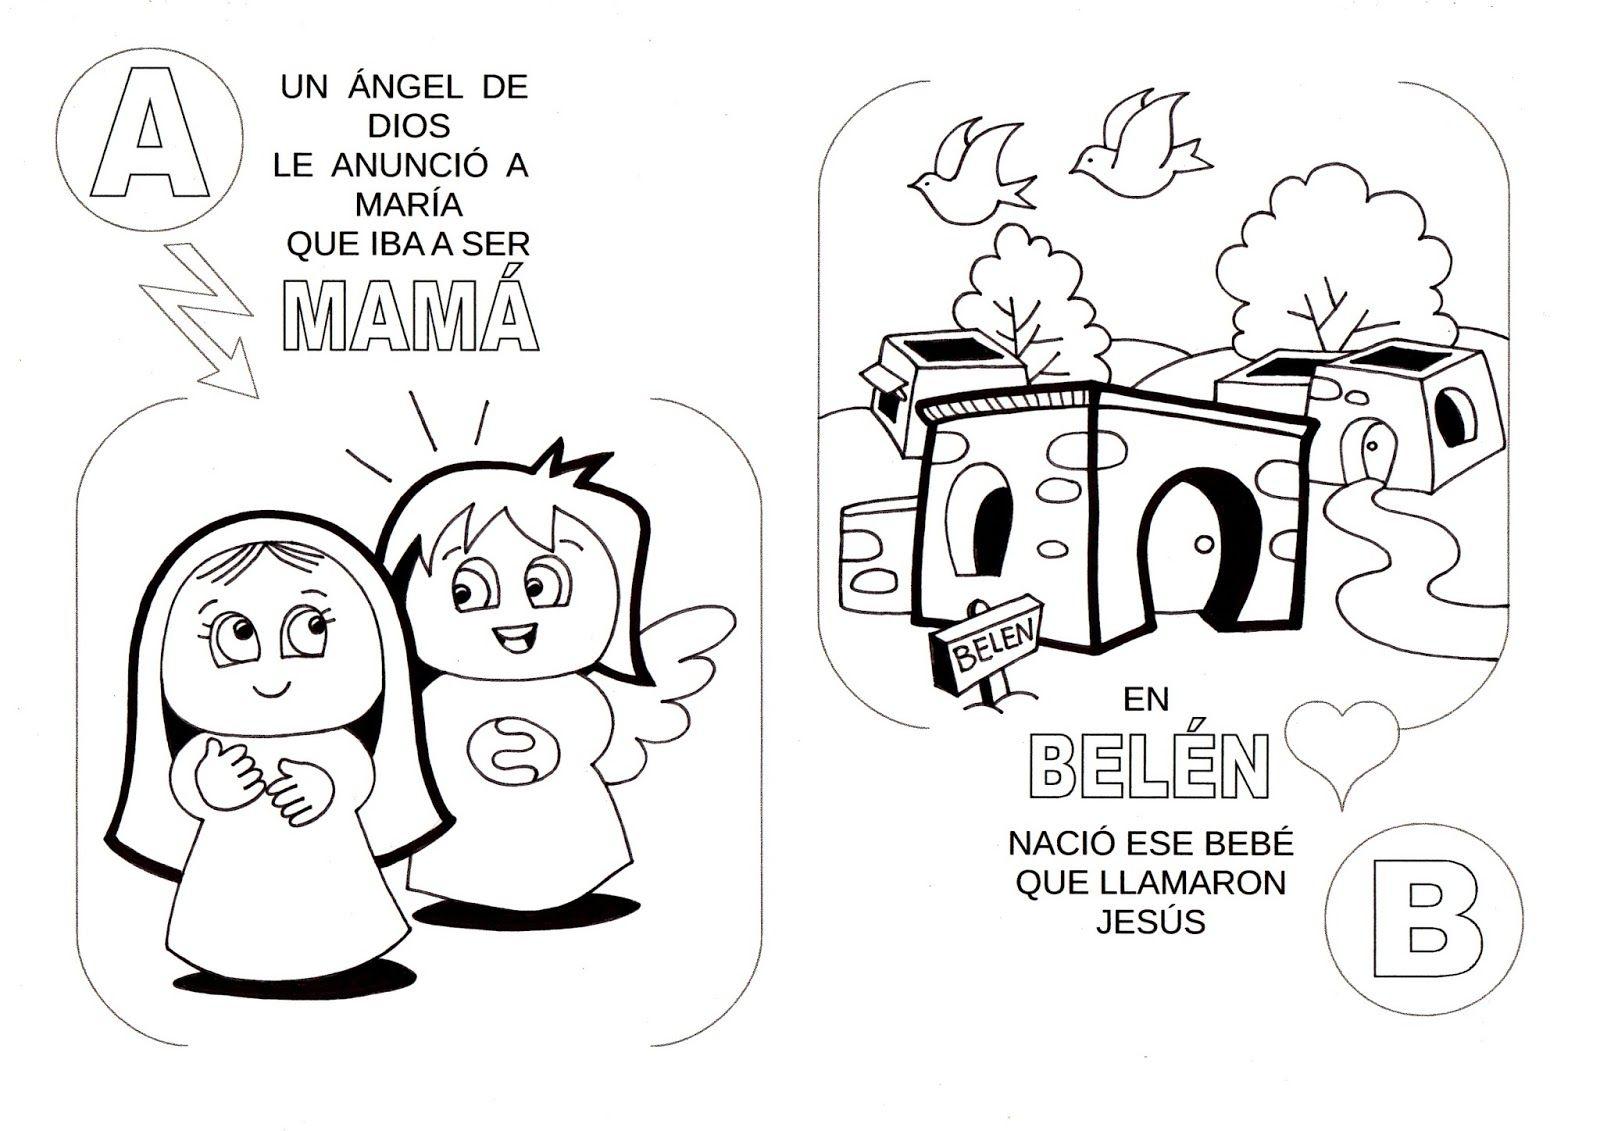 Dibujos De La Biblia Para Colorear E Imprimir: Laminas De La Biblia Para Colorear ,Imprimir Y Recortar